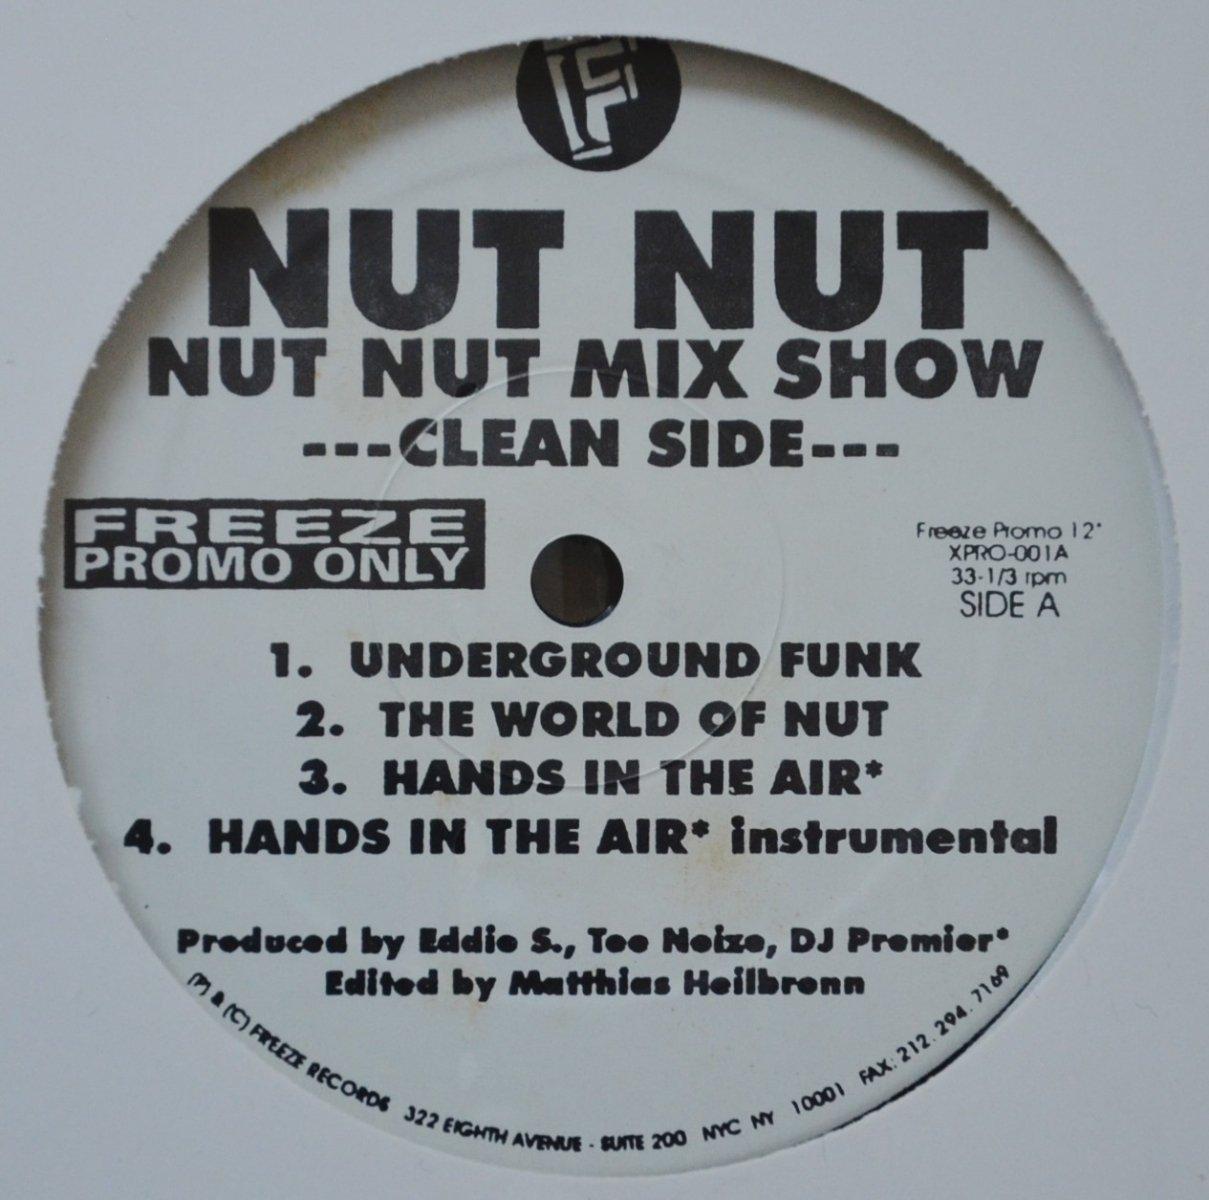 NUT NUT / UNDERGROUND FUNK / HANDS IN THE AIR (PROD BY DJ PREMIER) (NUT NUT MIX SHOW) (12